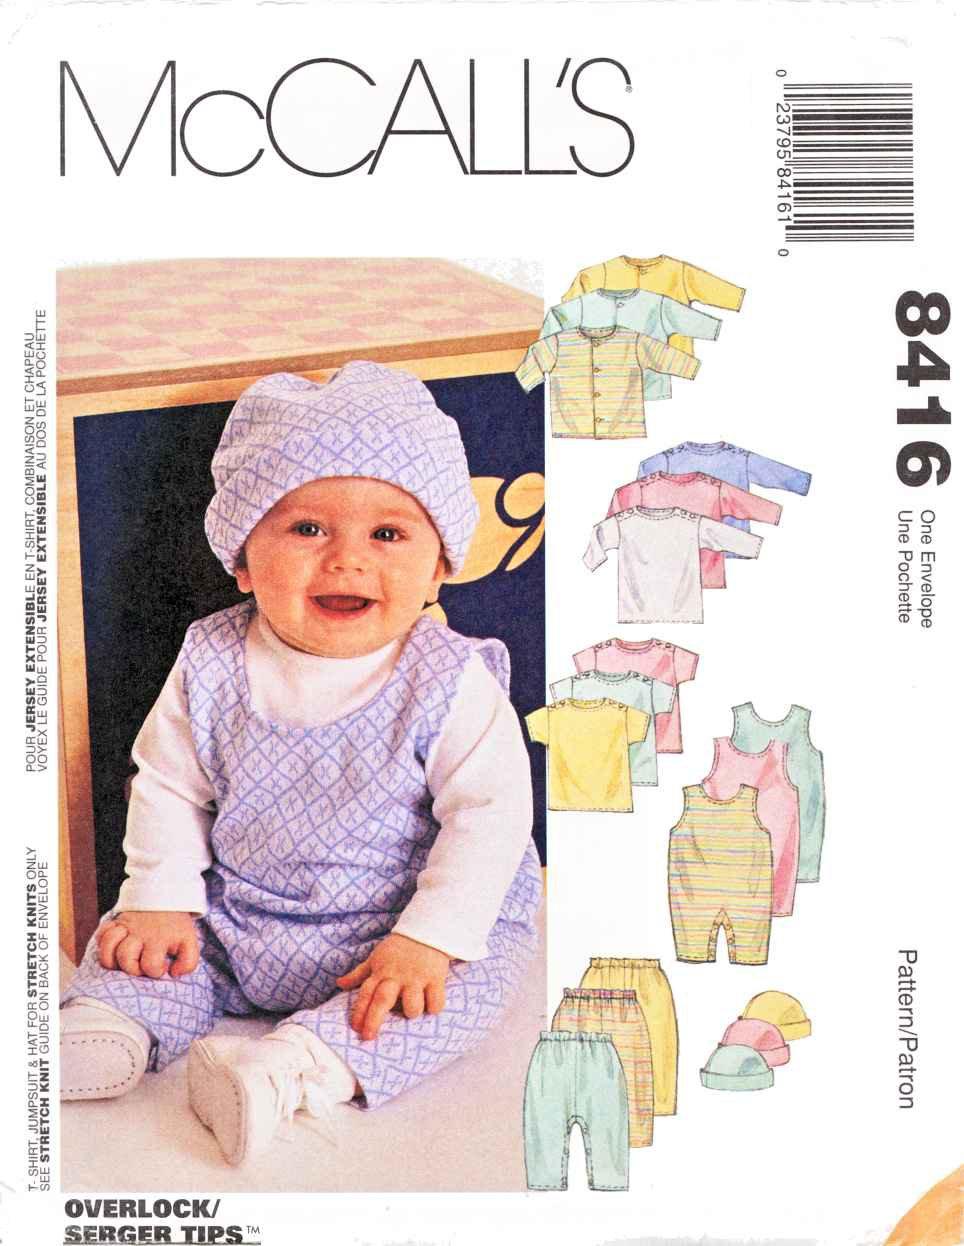 McCalls Sewing Pattern 8416 Baby Infant Size 13-24# Layette Knit T-Shirt Jumpsuit Cap